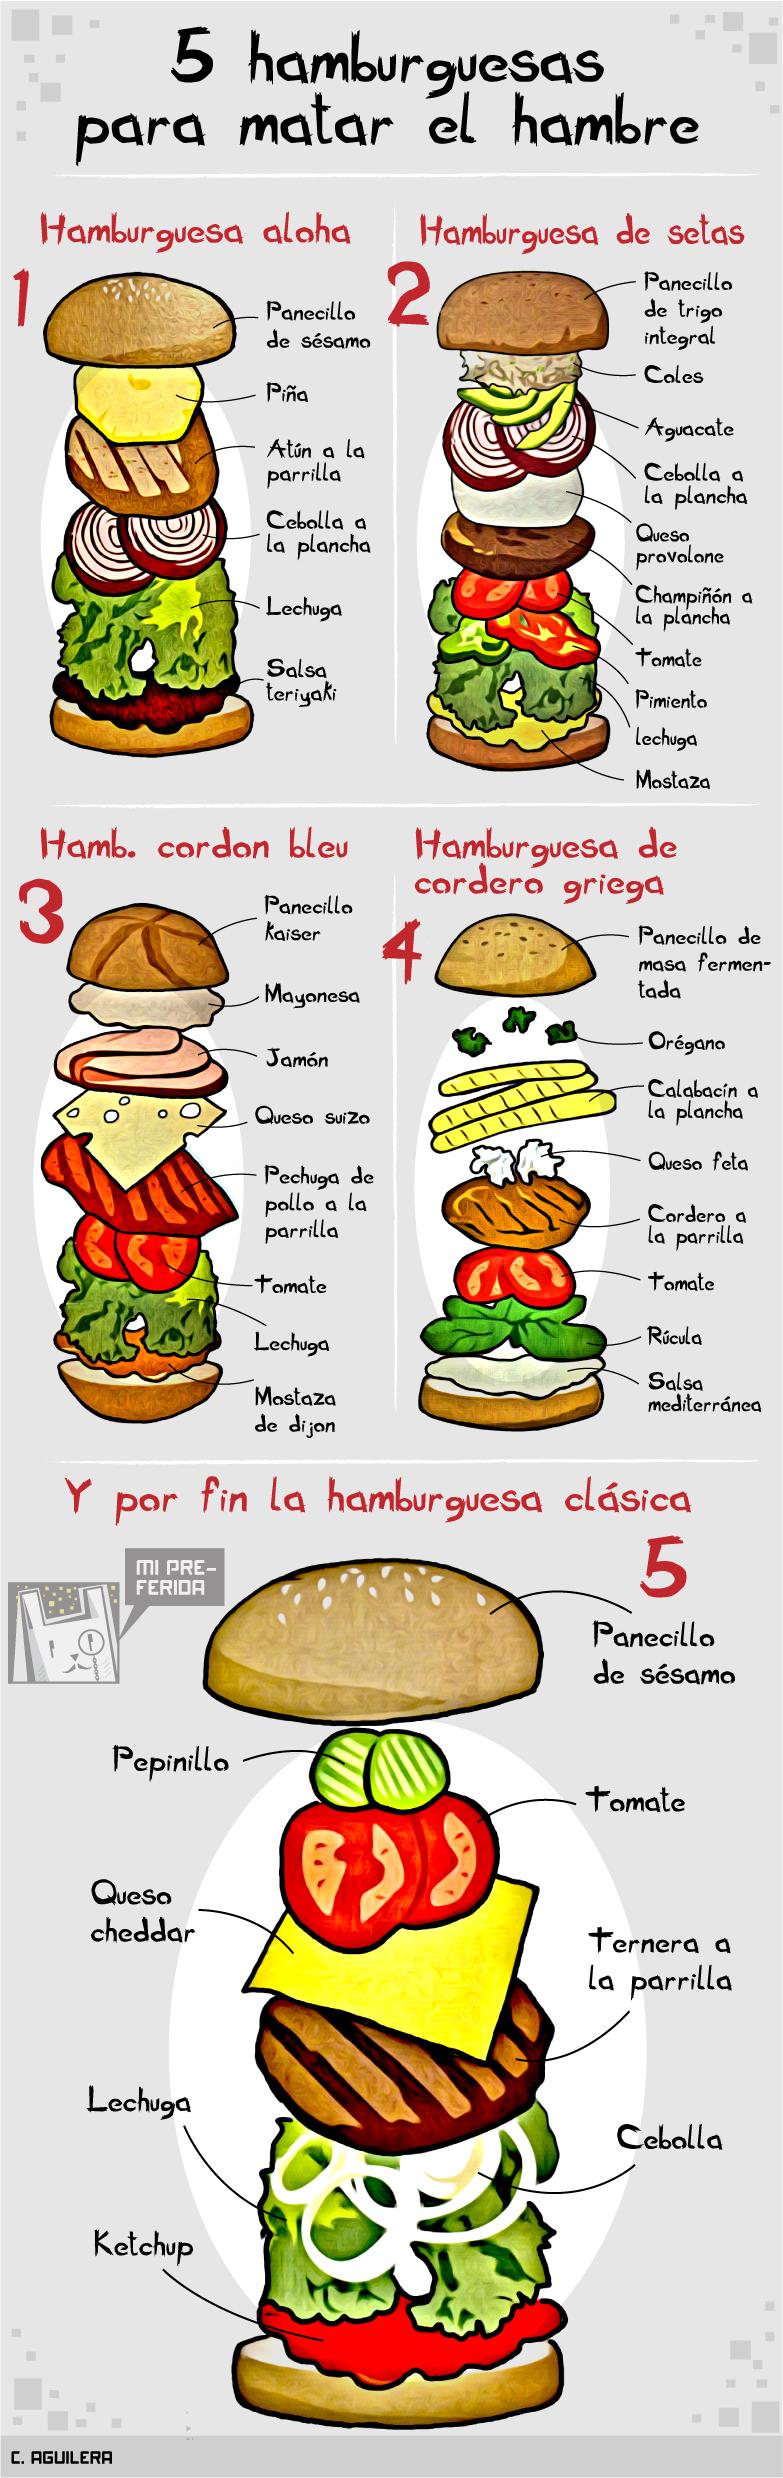 hamburguesaS 2